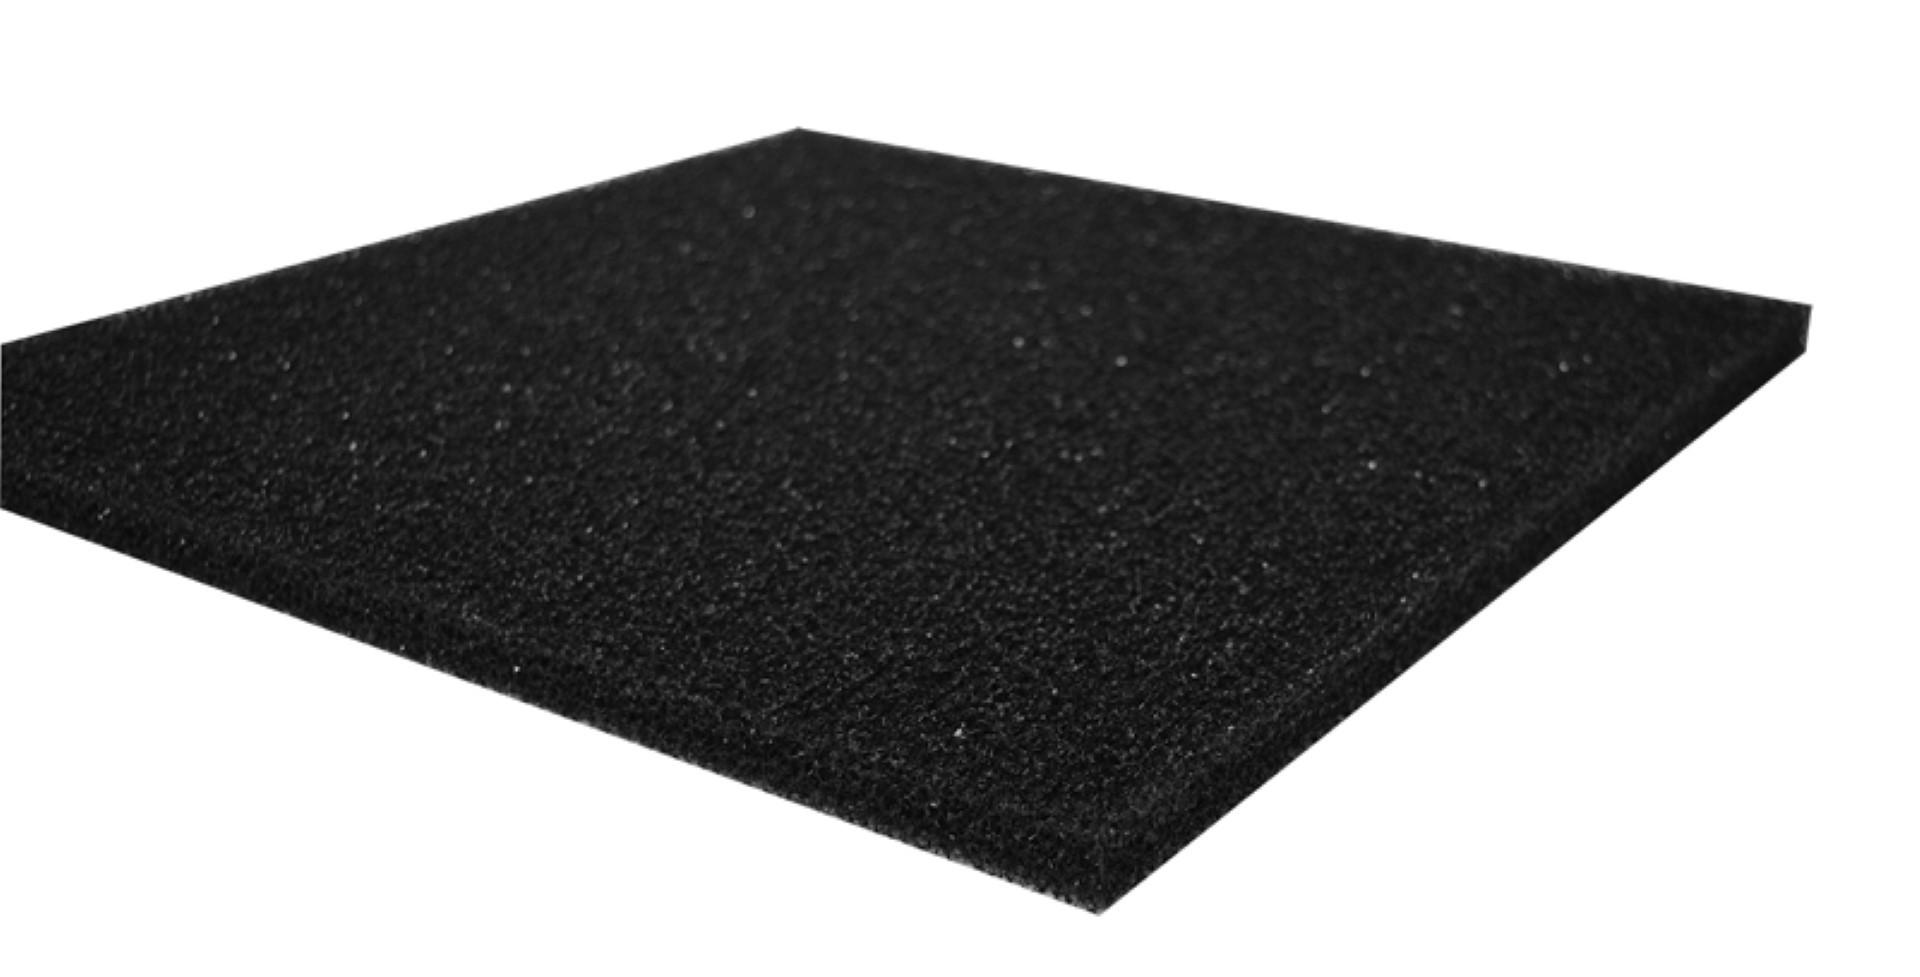 Filter Foam 50X50X2 Cm Grof vijver